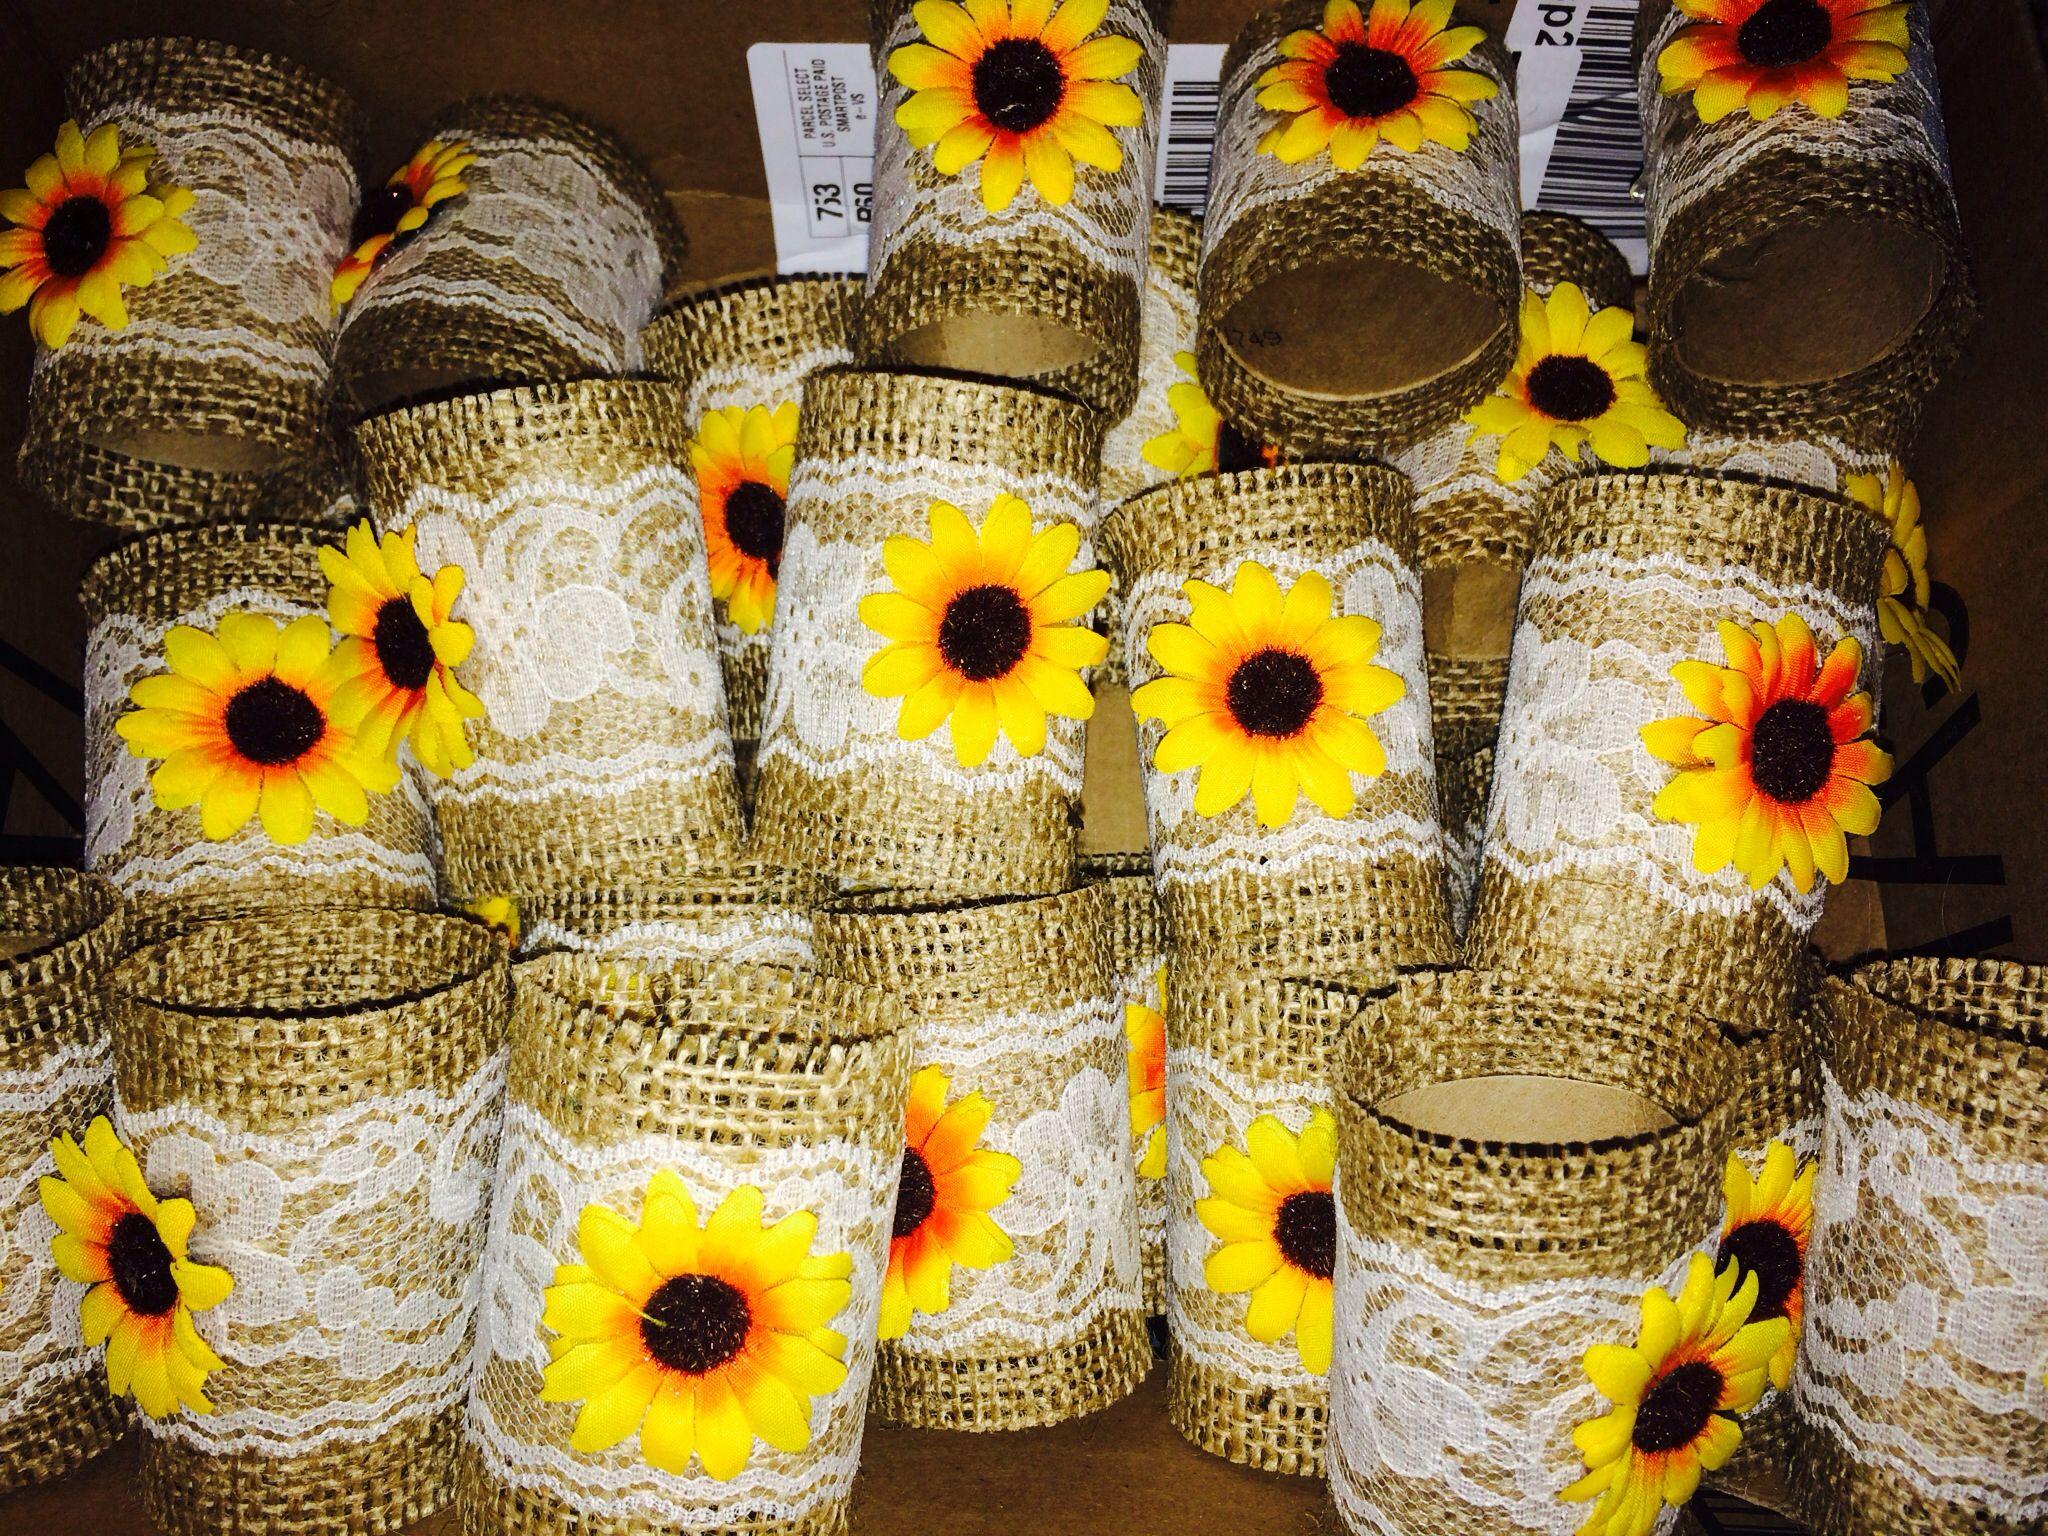 Sunflower Napkin Rings (Made From Tp Rolls)